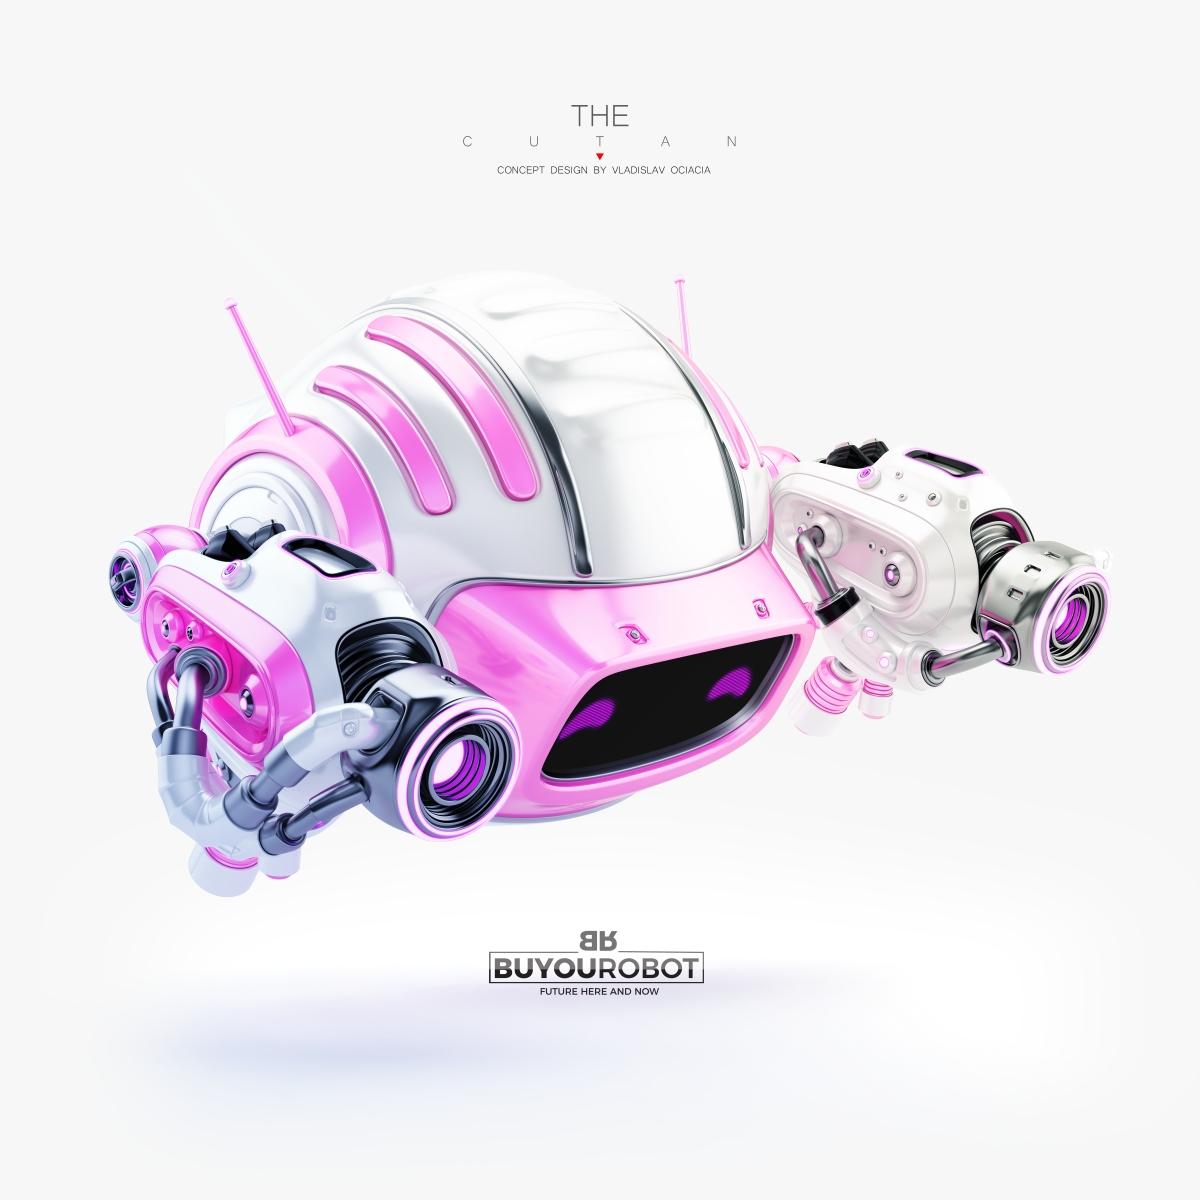 Cute robotic aerial toy with futuristic blaster gun - CUTAN